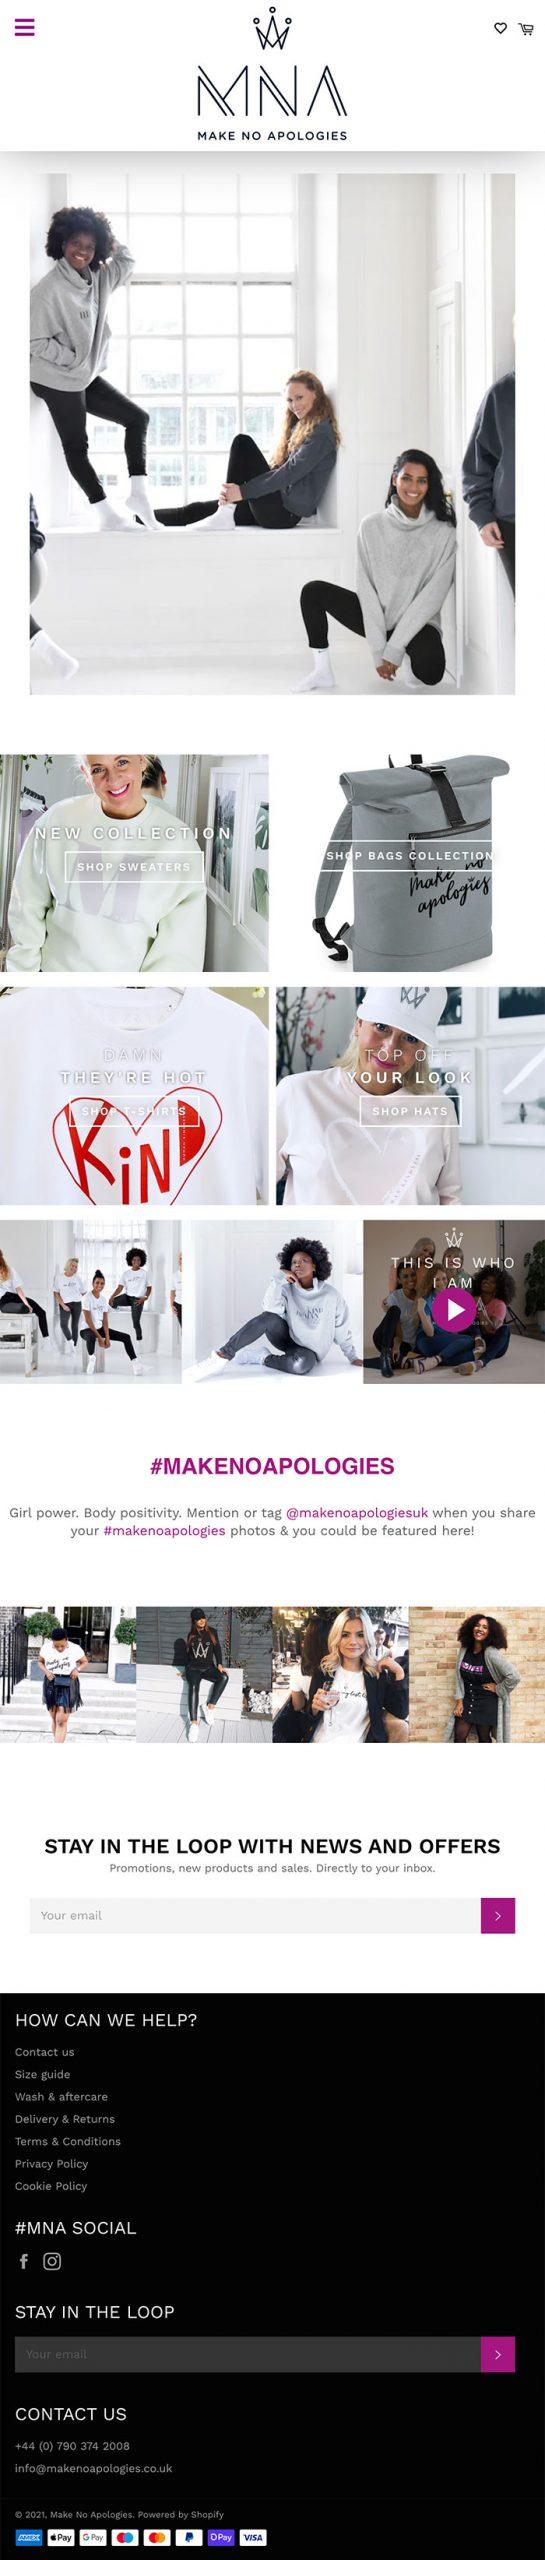 Make No Apologies Website (Tablet)